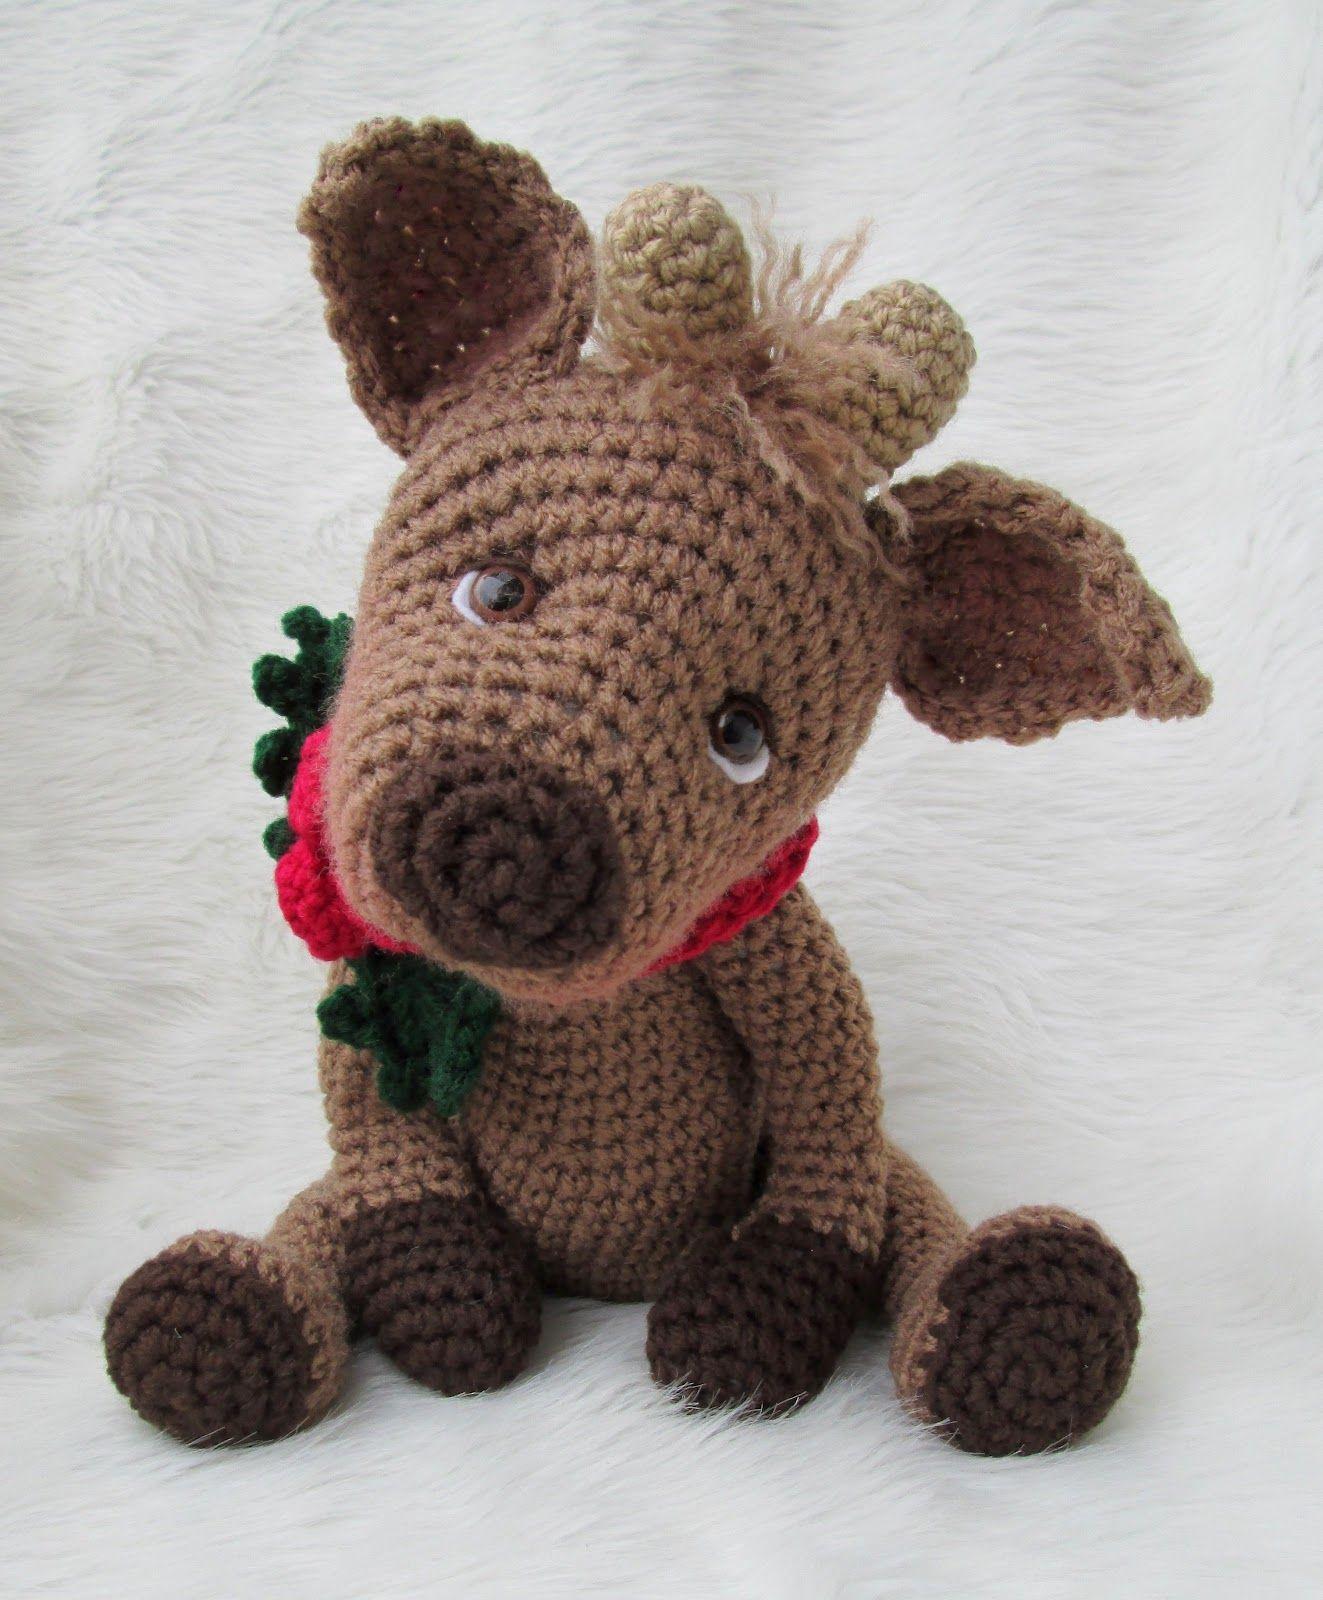 Free Christmas Crochet Patterns | Free crochet, Crochet and Patterns